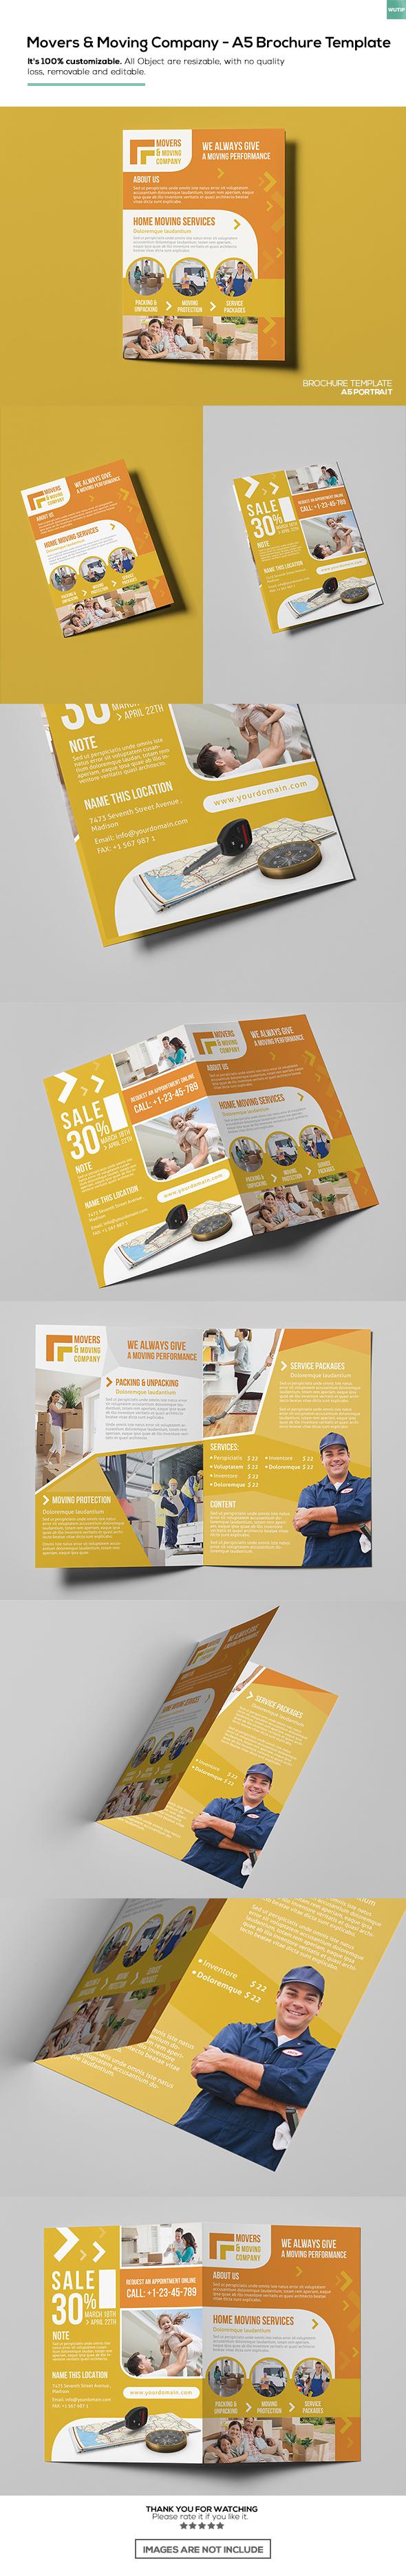 FreeMovers Moving CompanyA Brochure Template On Behance - Moving company flyer template